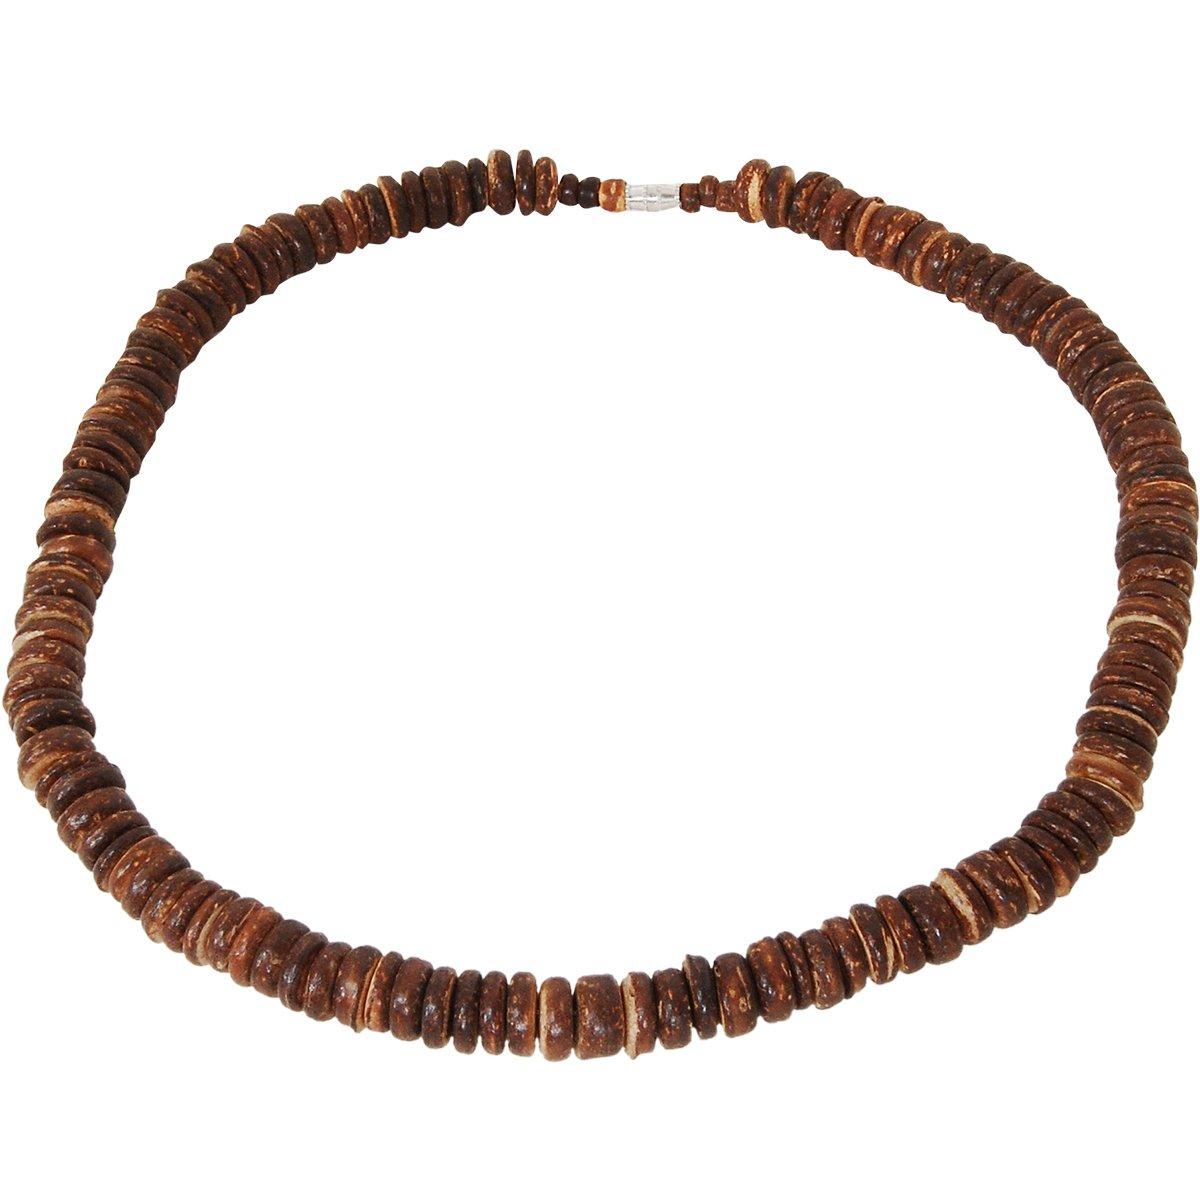 Tribal Hollywood Lanai Brown Coconut Shell Discs Hawaiian Mens Bead Choker Necklace